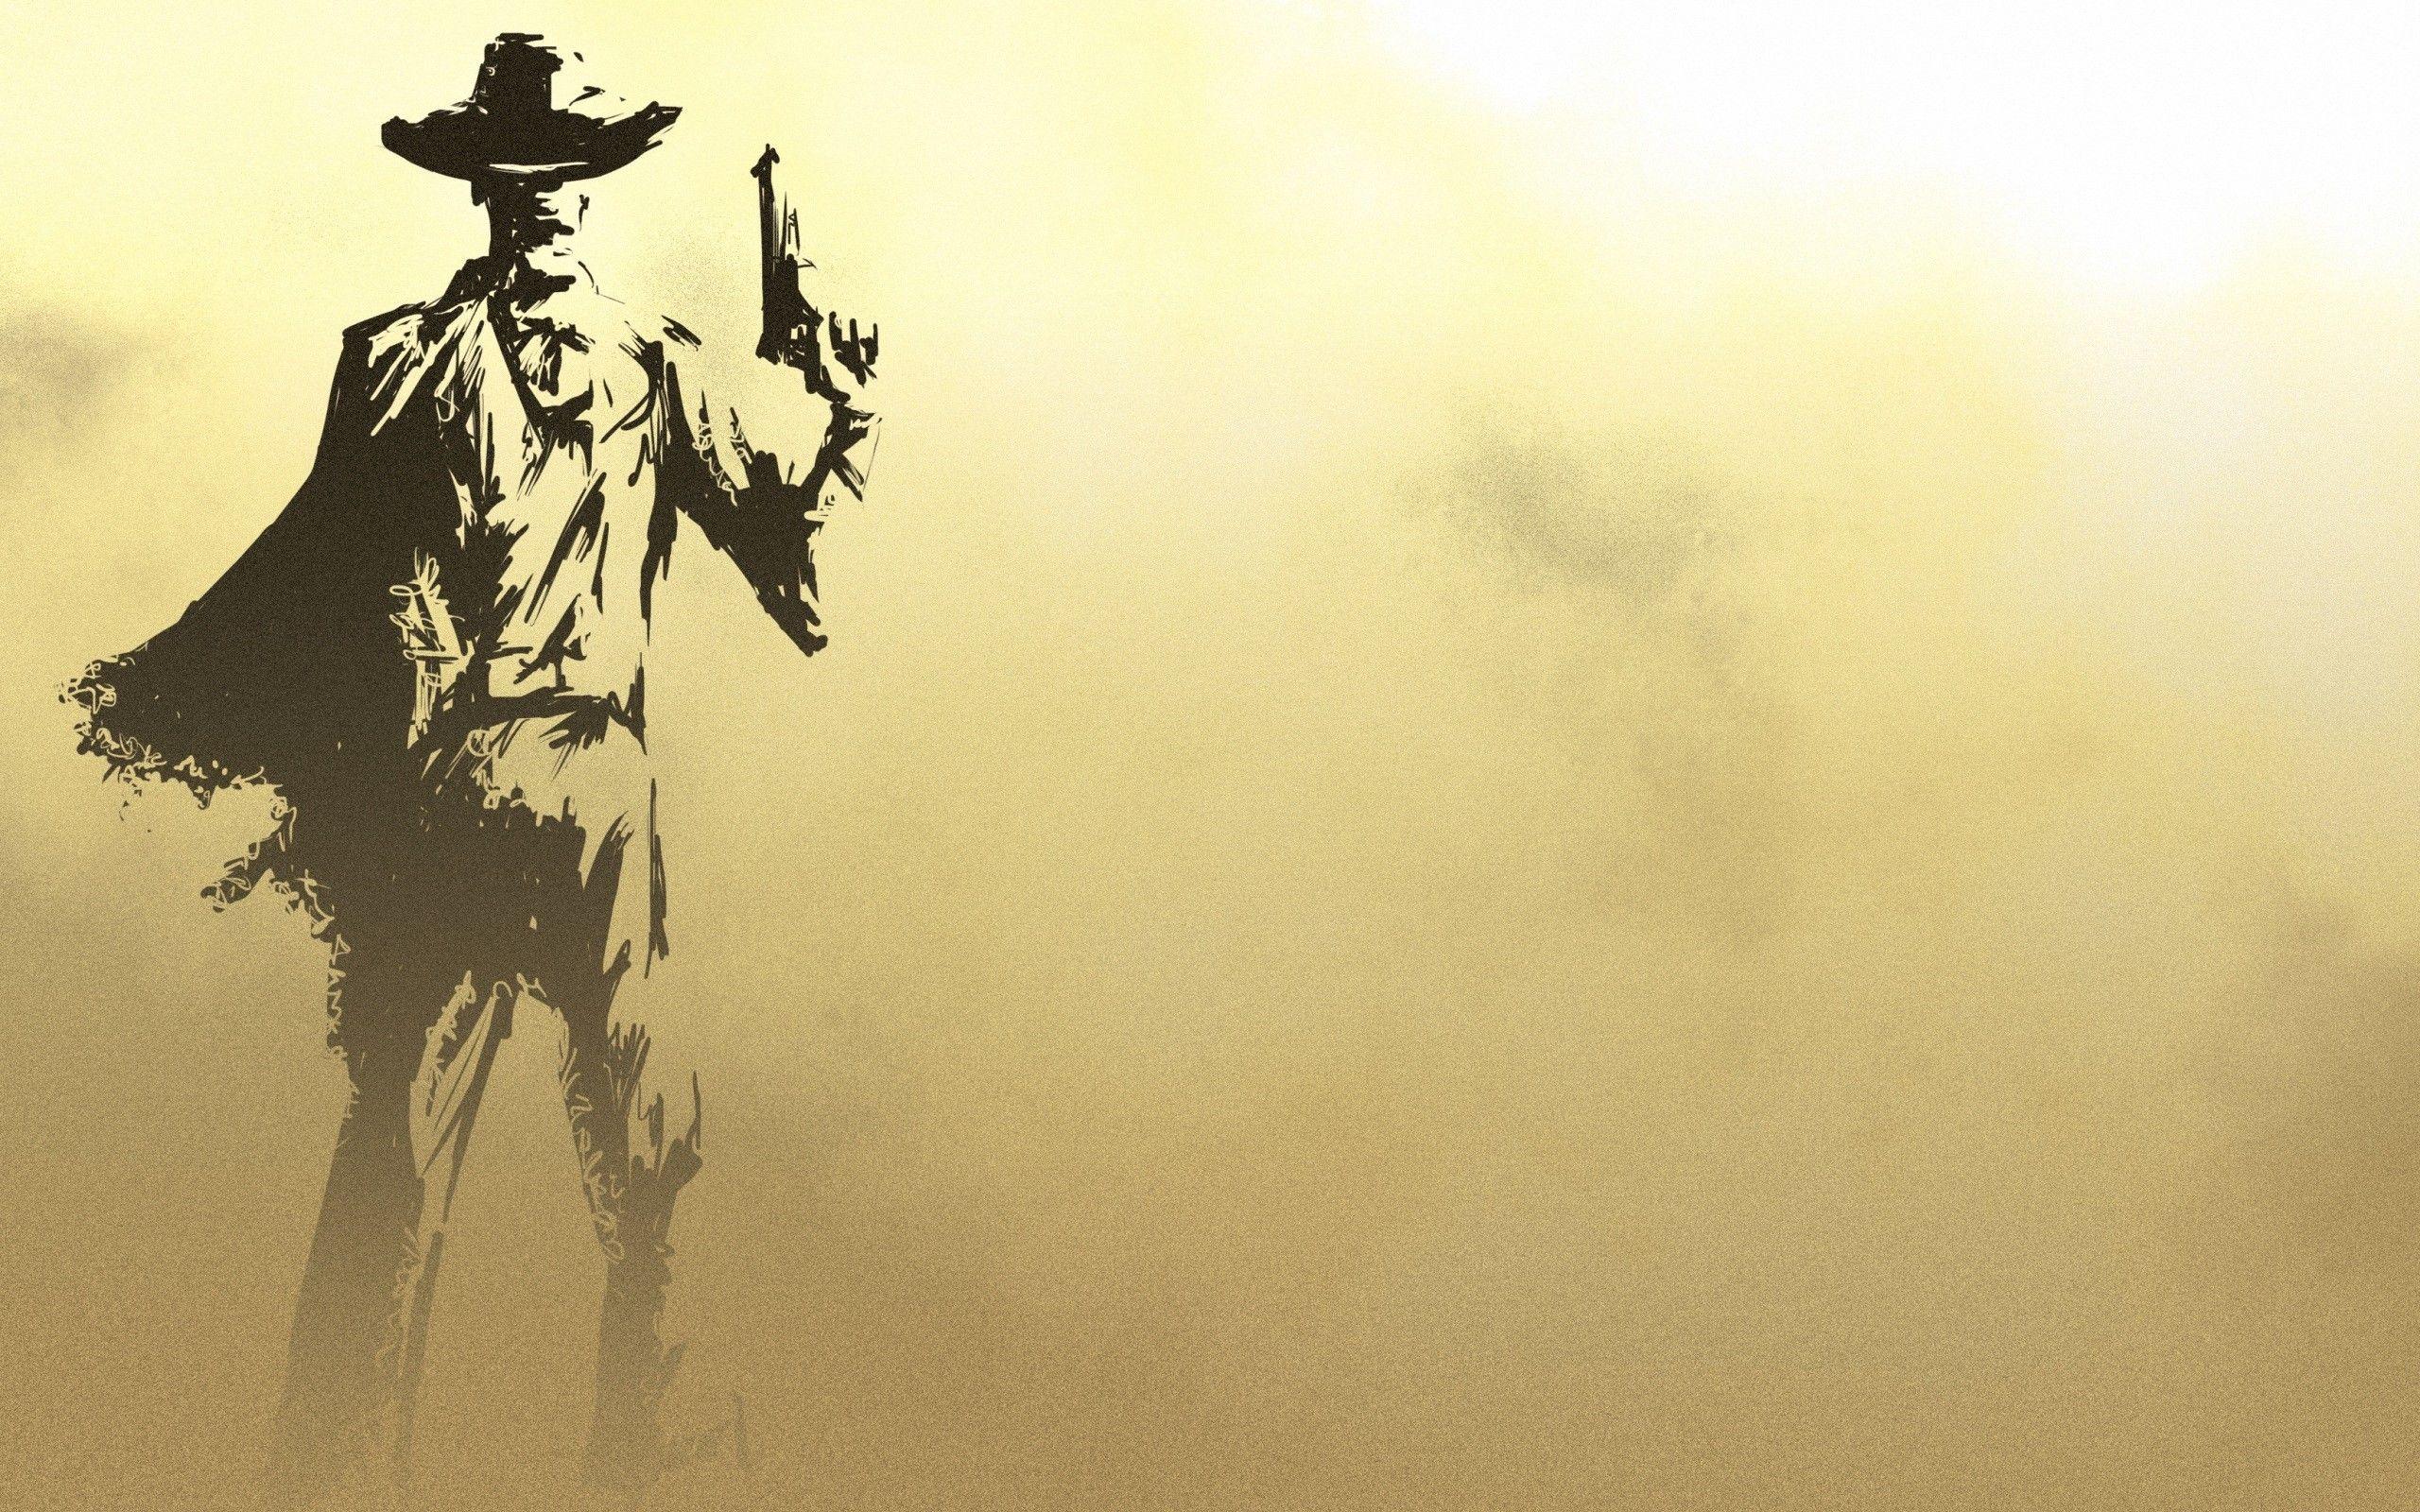 Minimalistic Sketched Gunslinger Cowboy Bebop Wallpapers Cowboy Pictures Widescreen Wallpaper